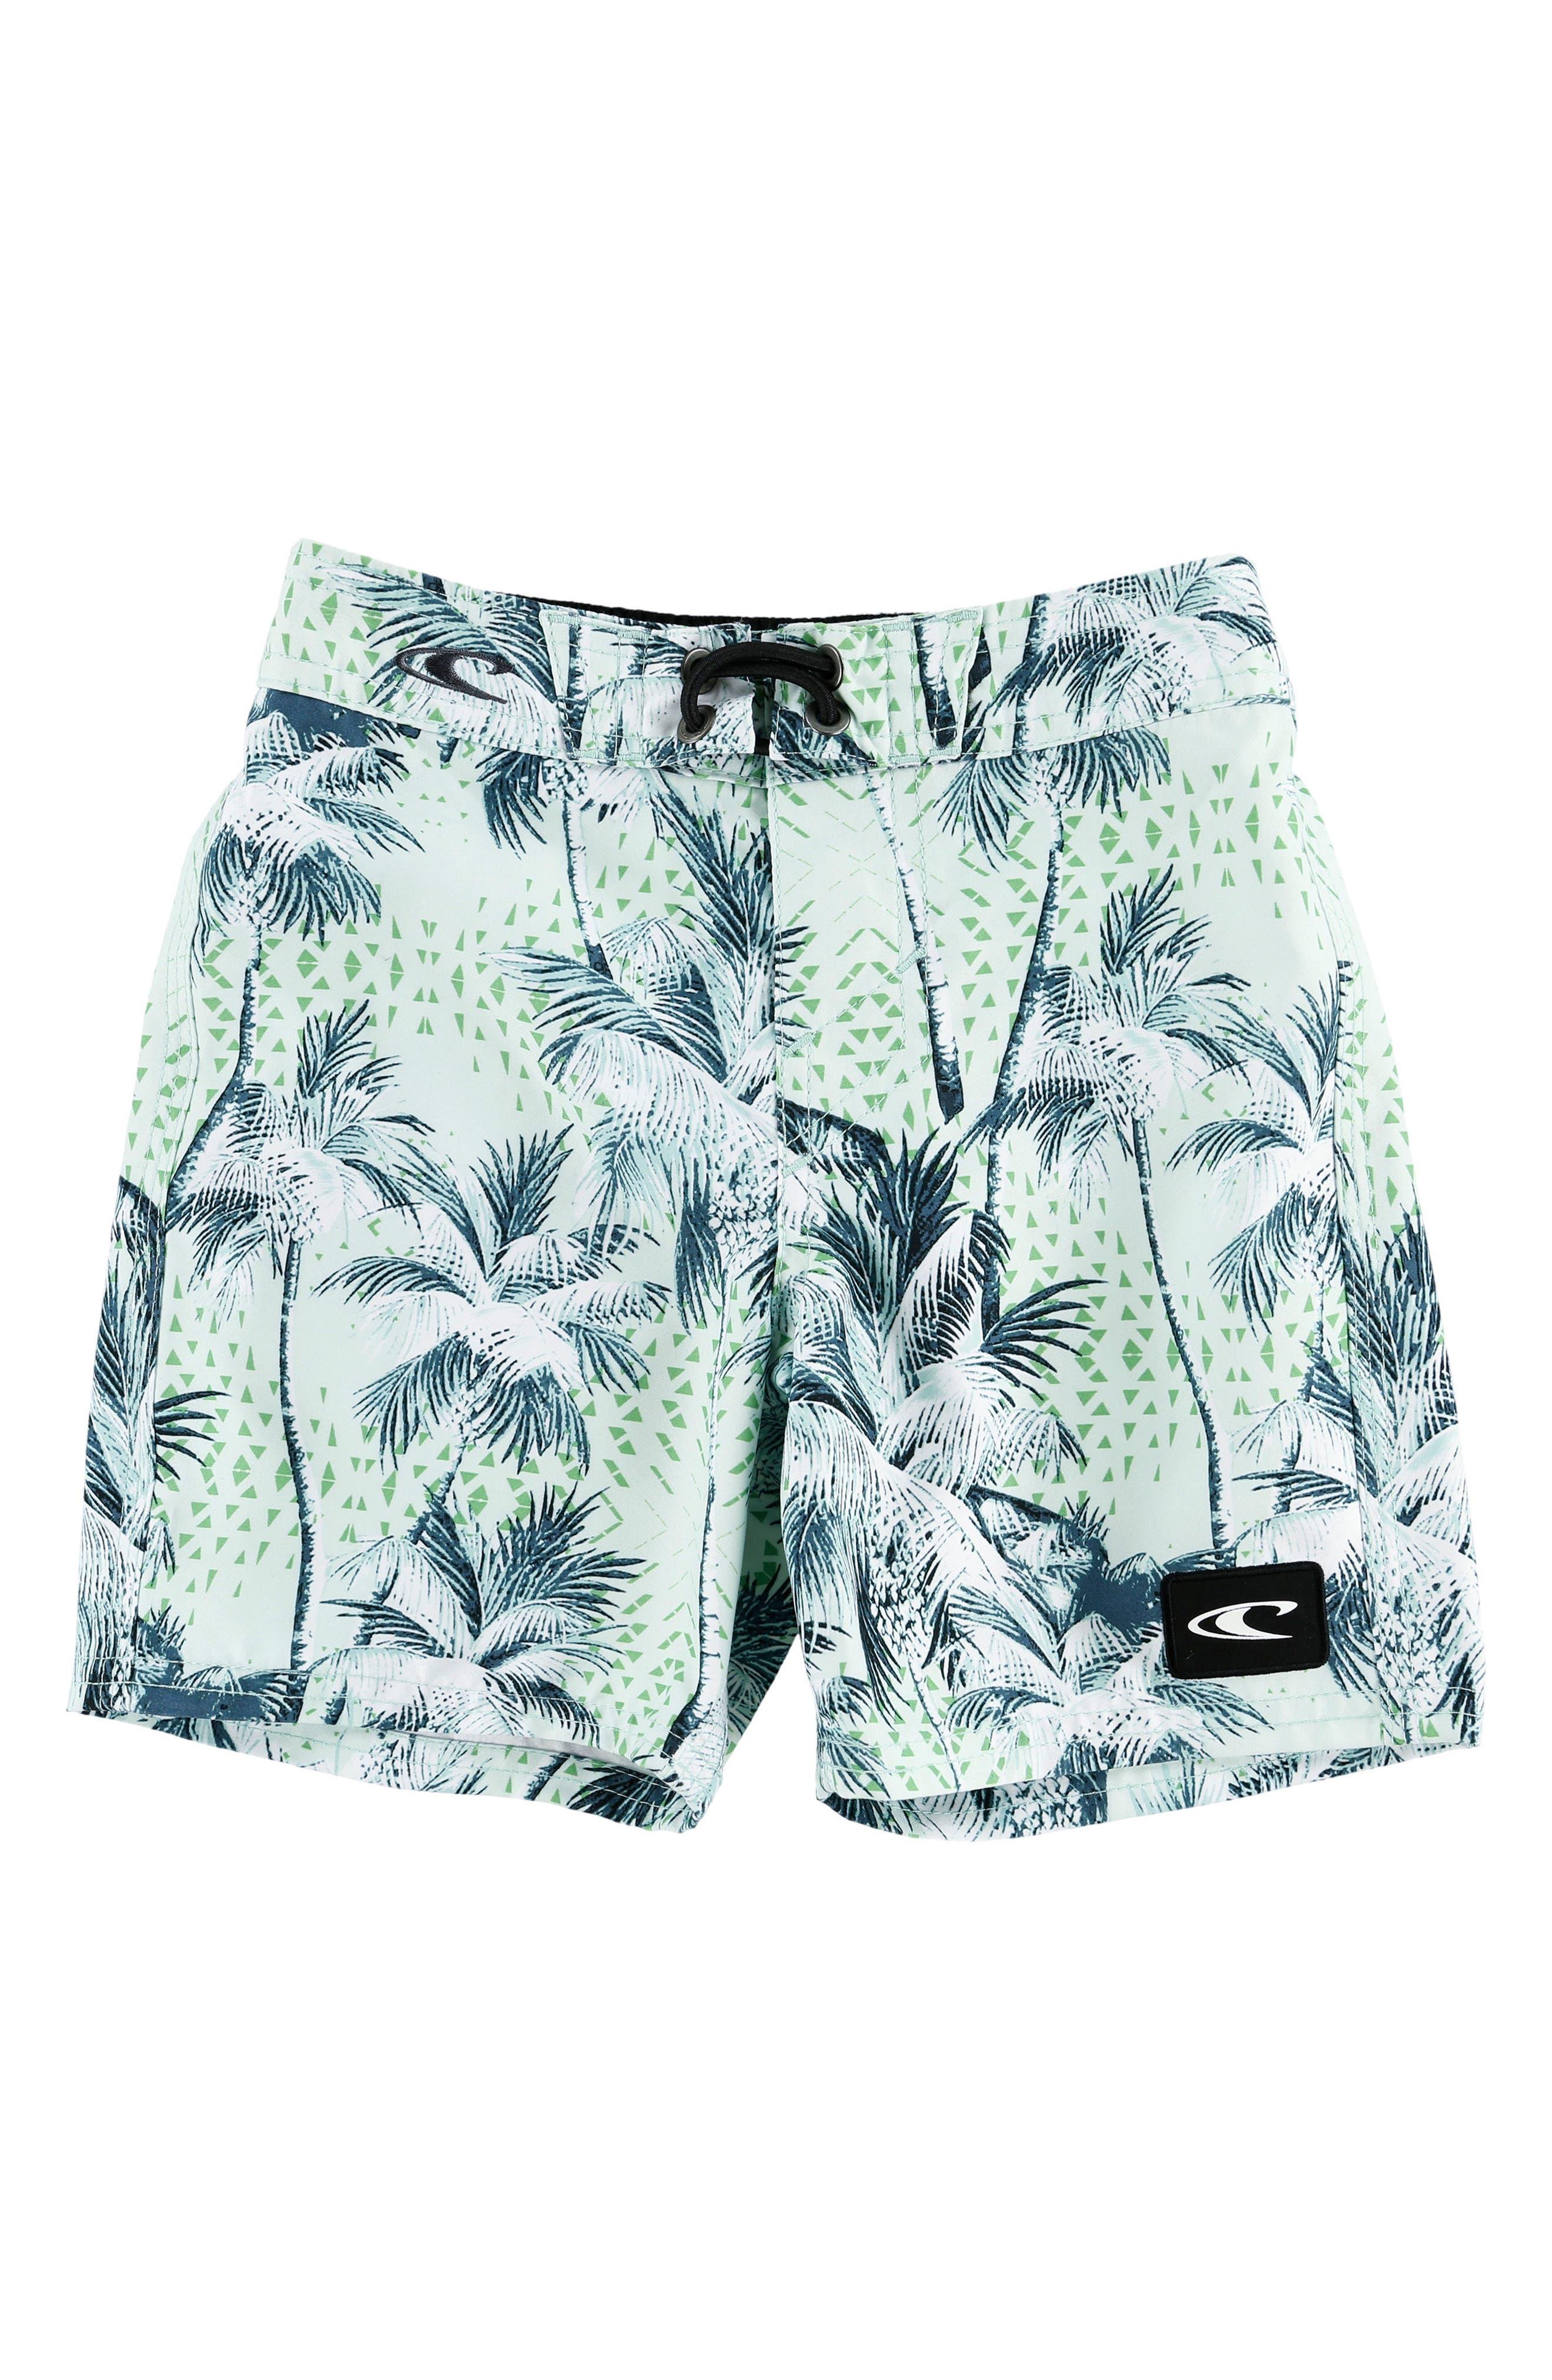 O'NEILL Darn Old Palmer Board Shorts, Main, color, 400